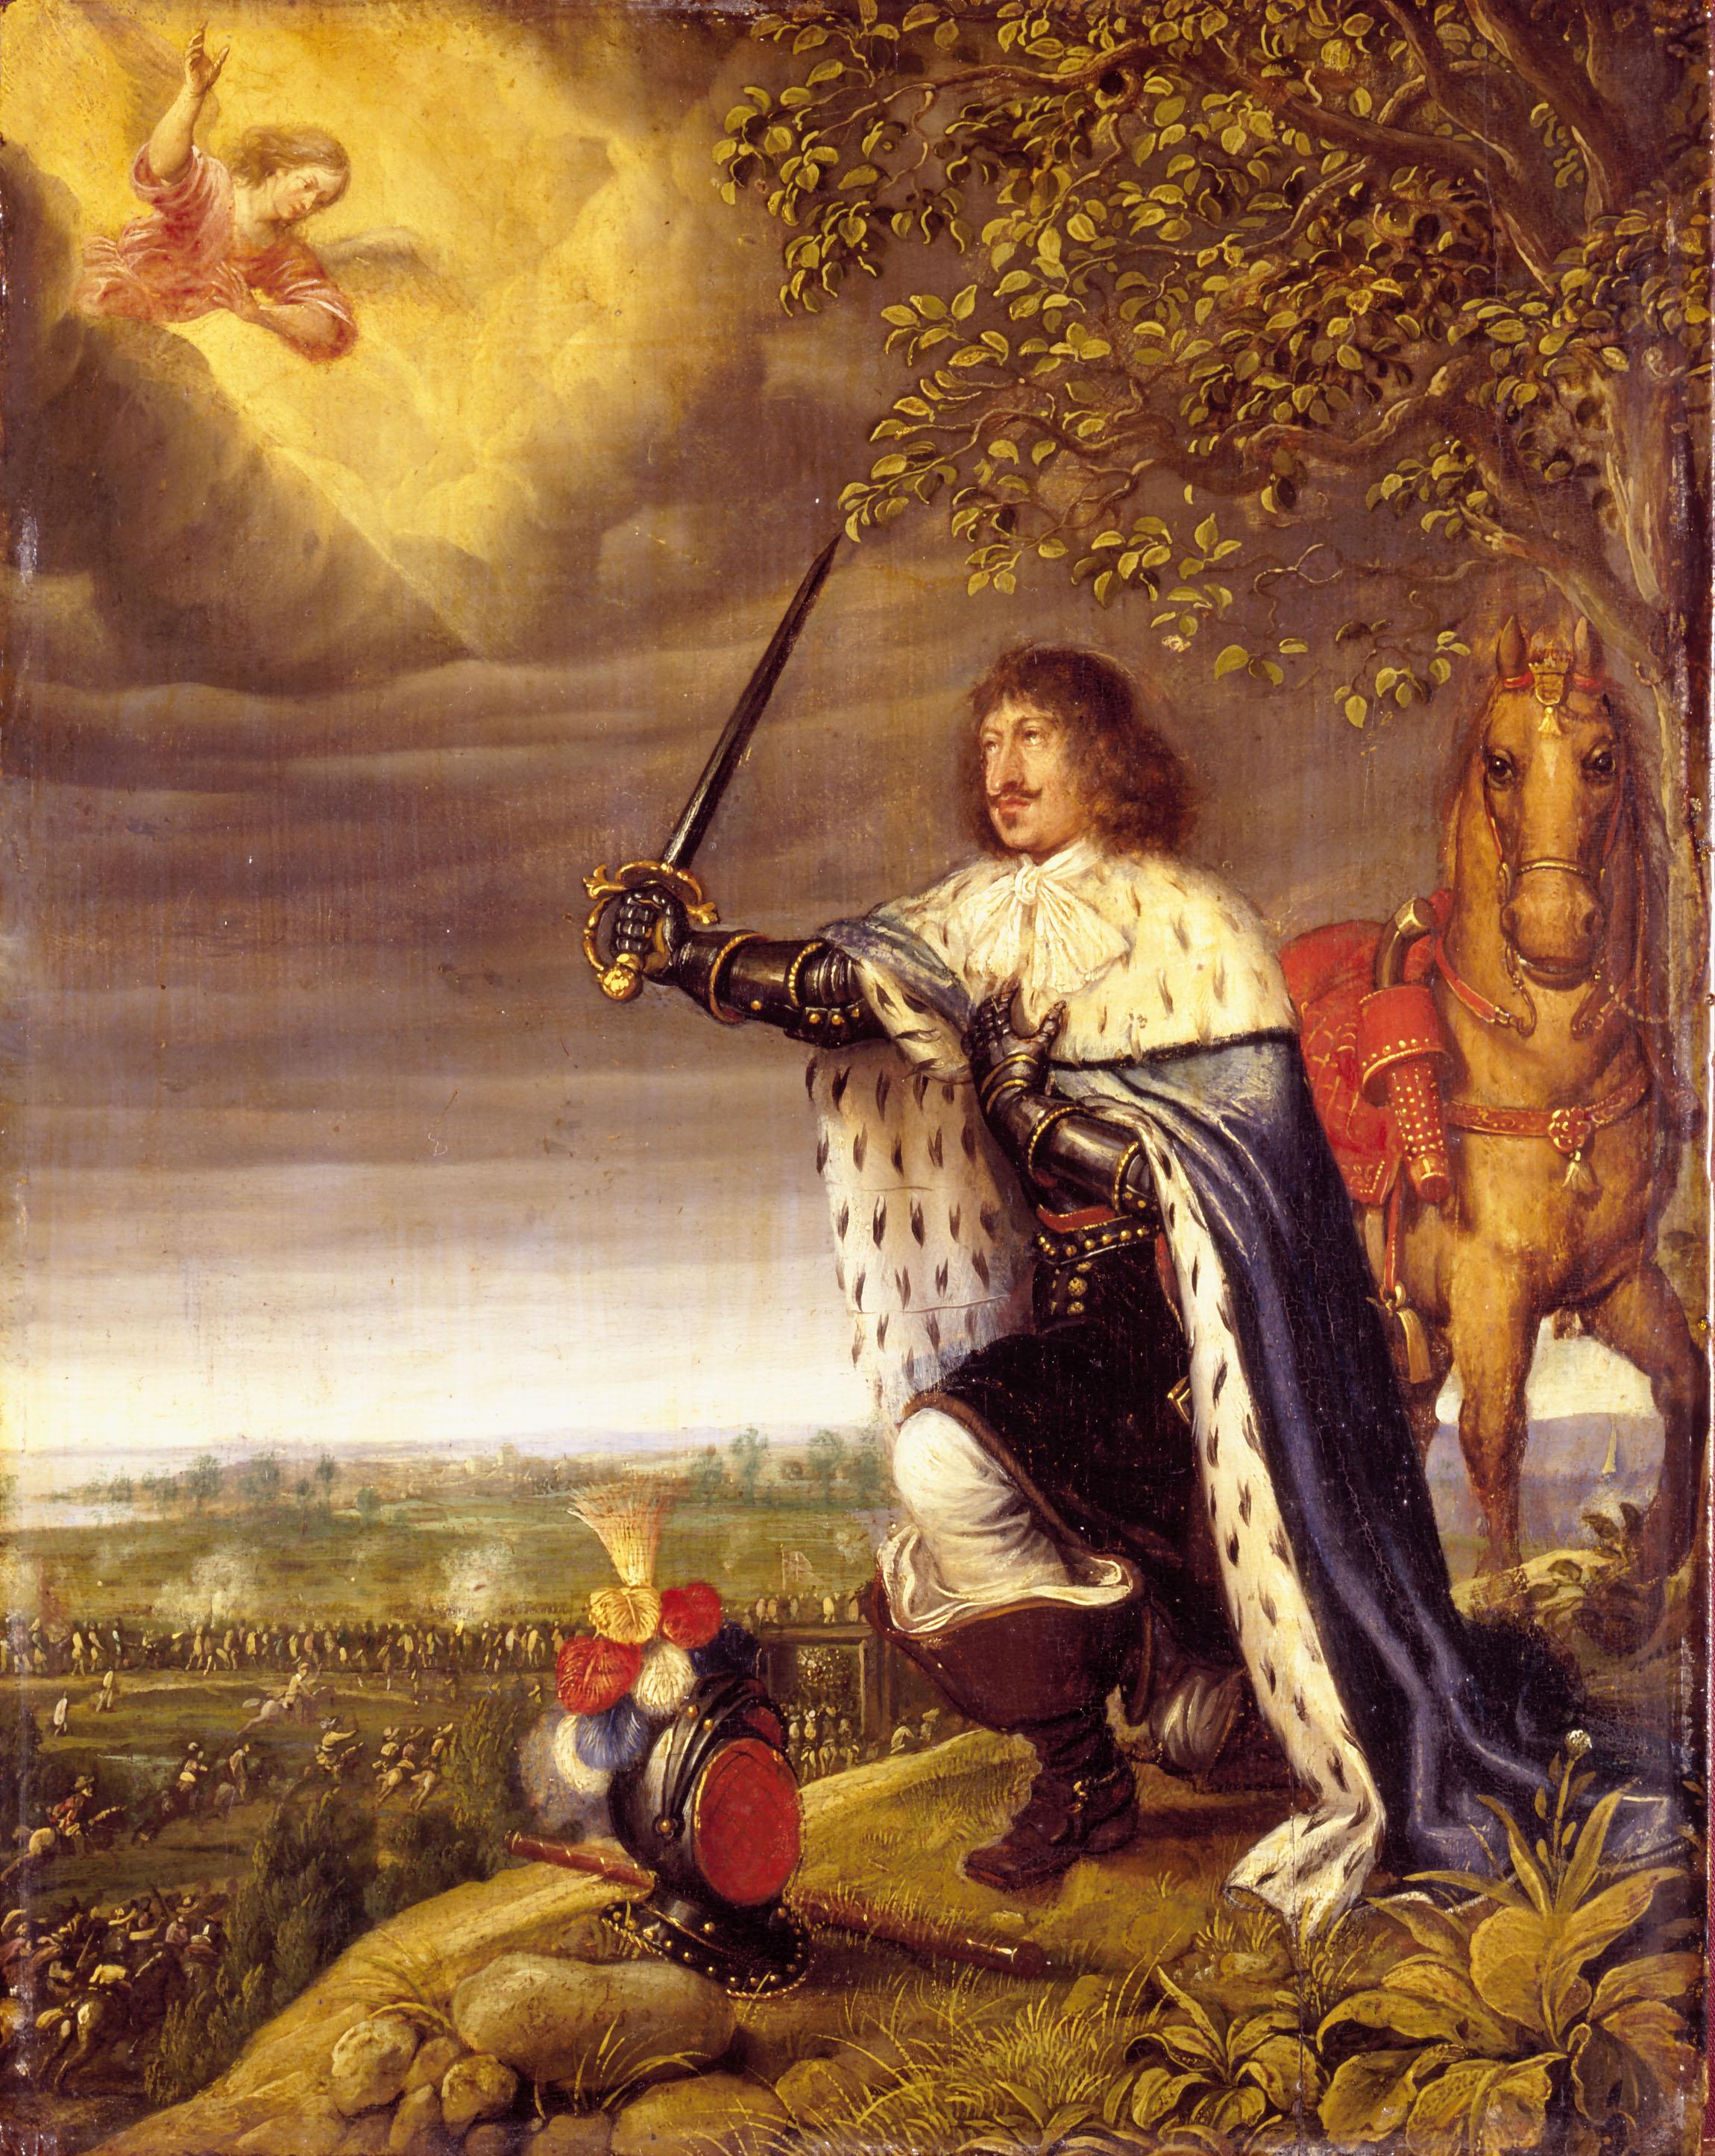 Frederik 3., 1609-1670